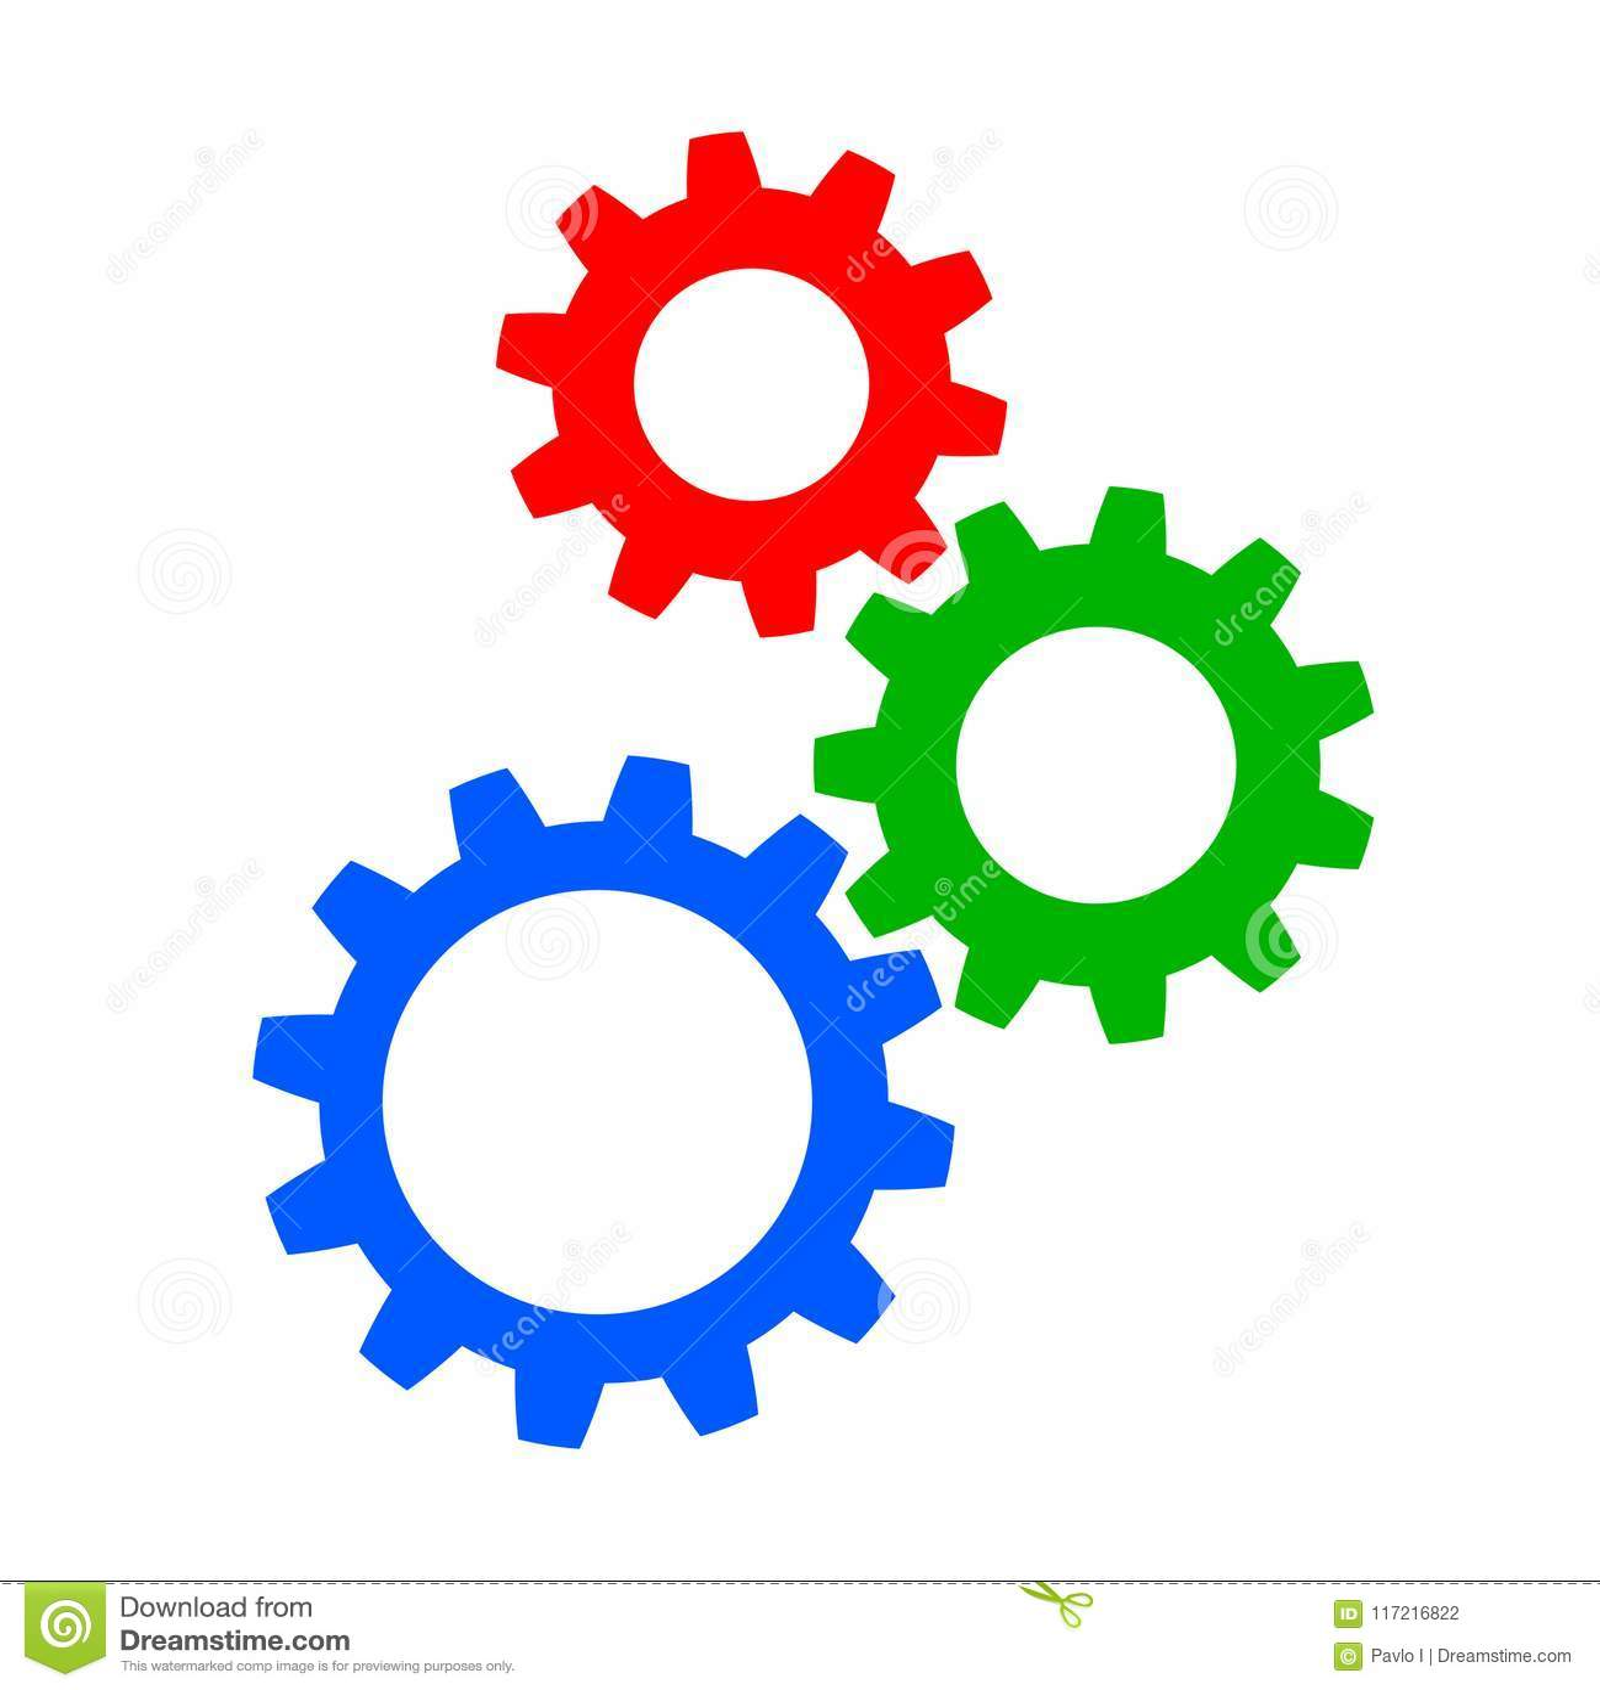 realization, concept teamwork, generator business idea - vector